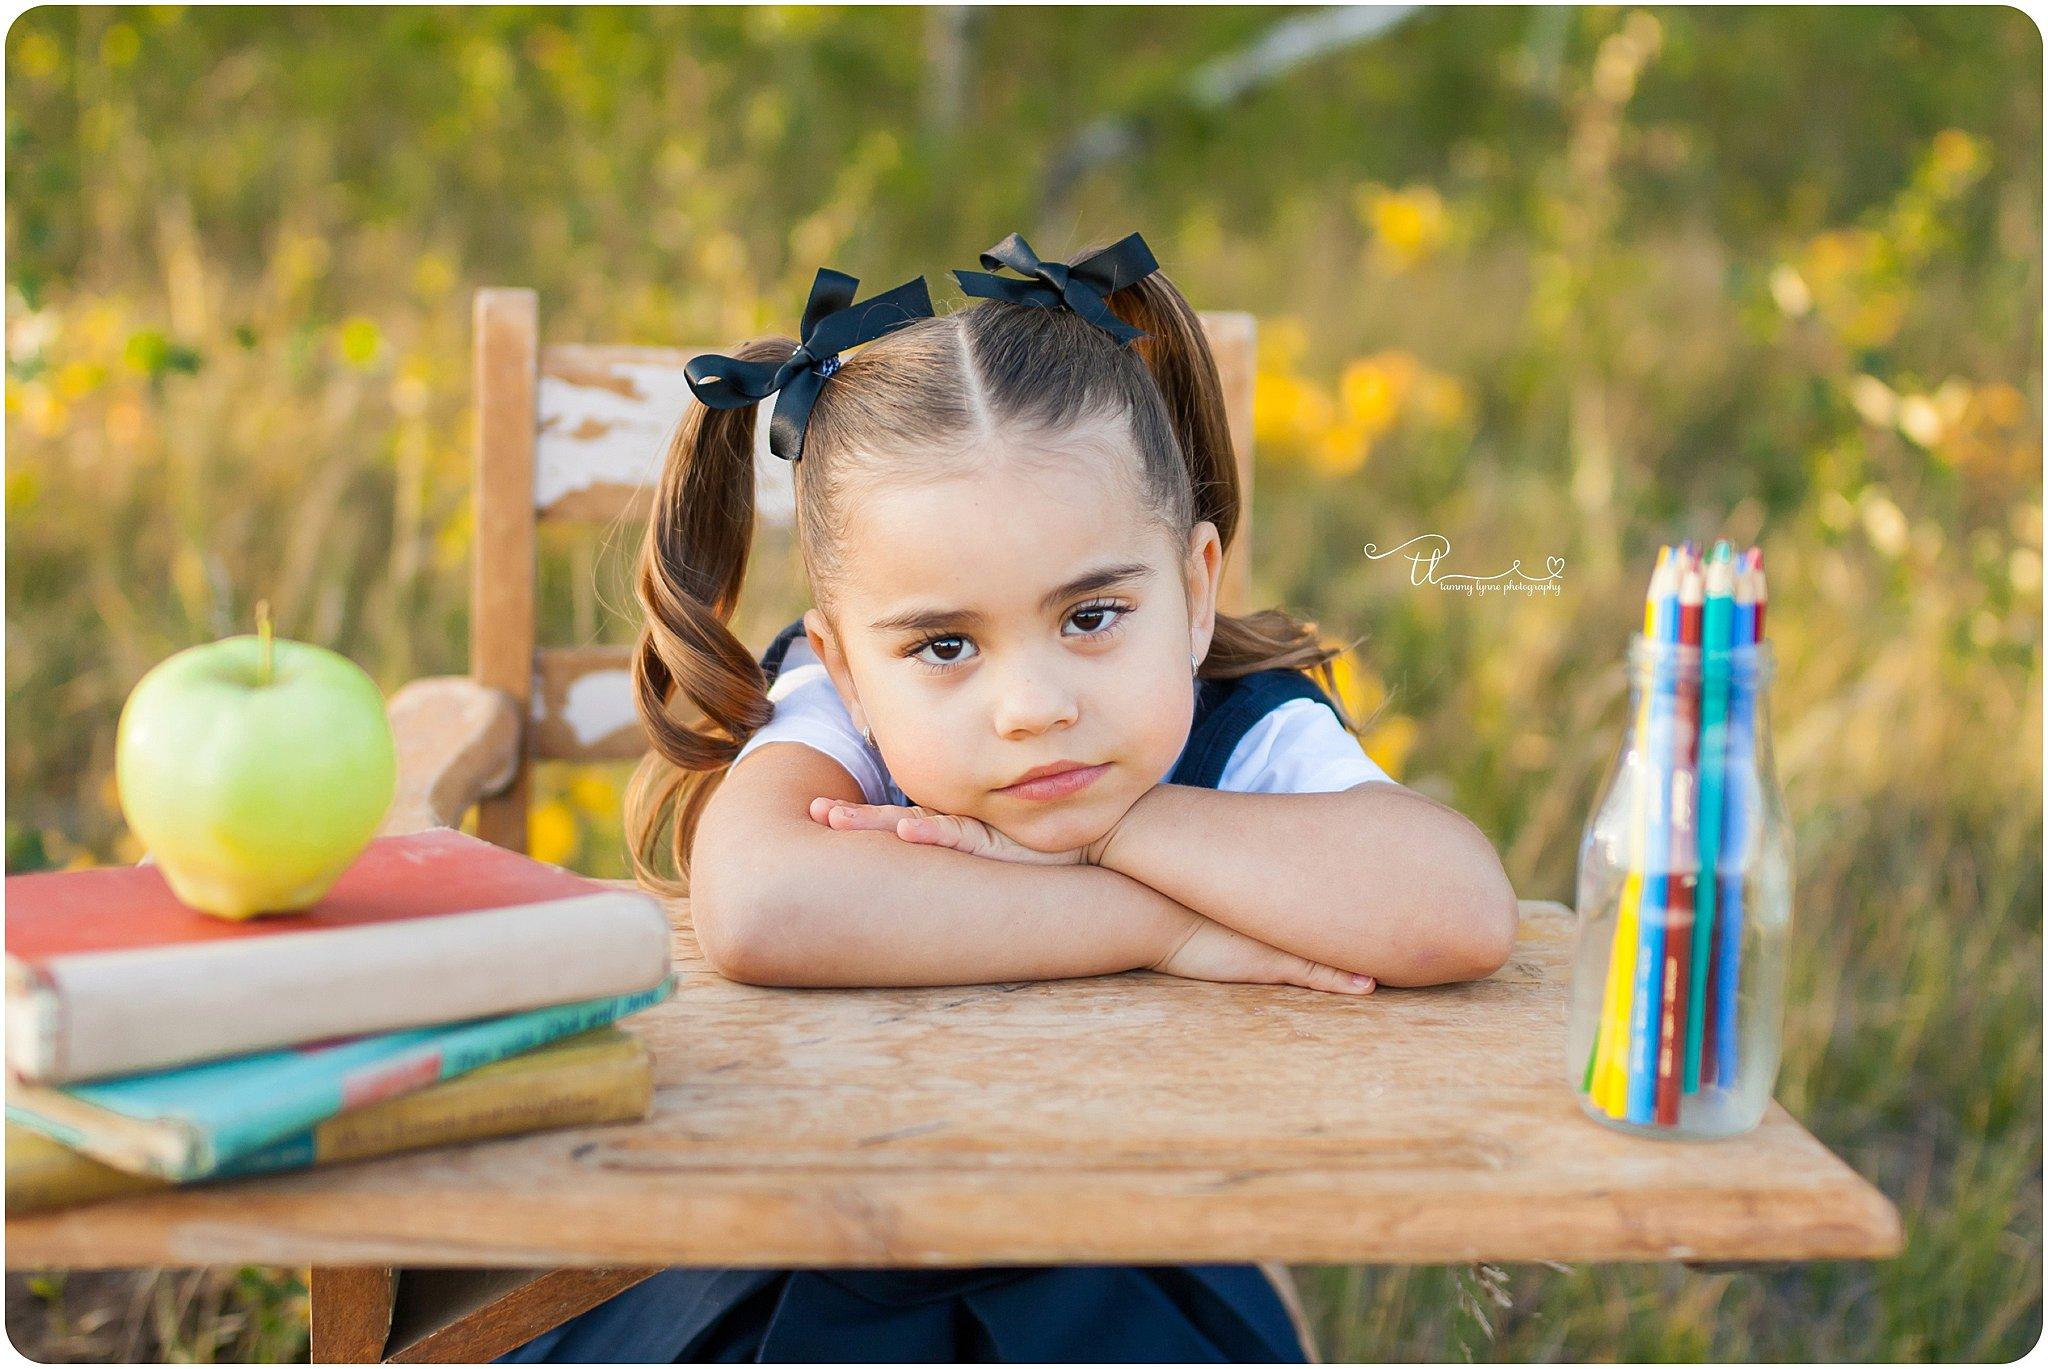 preschooler sitting at vintage desk with photo props